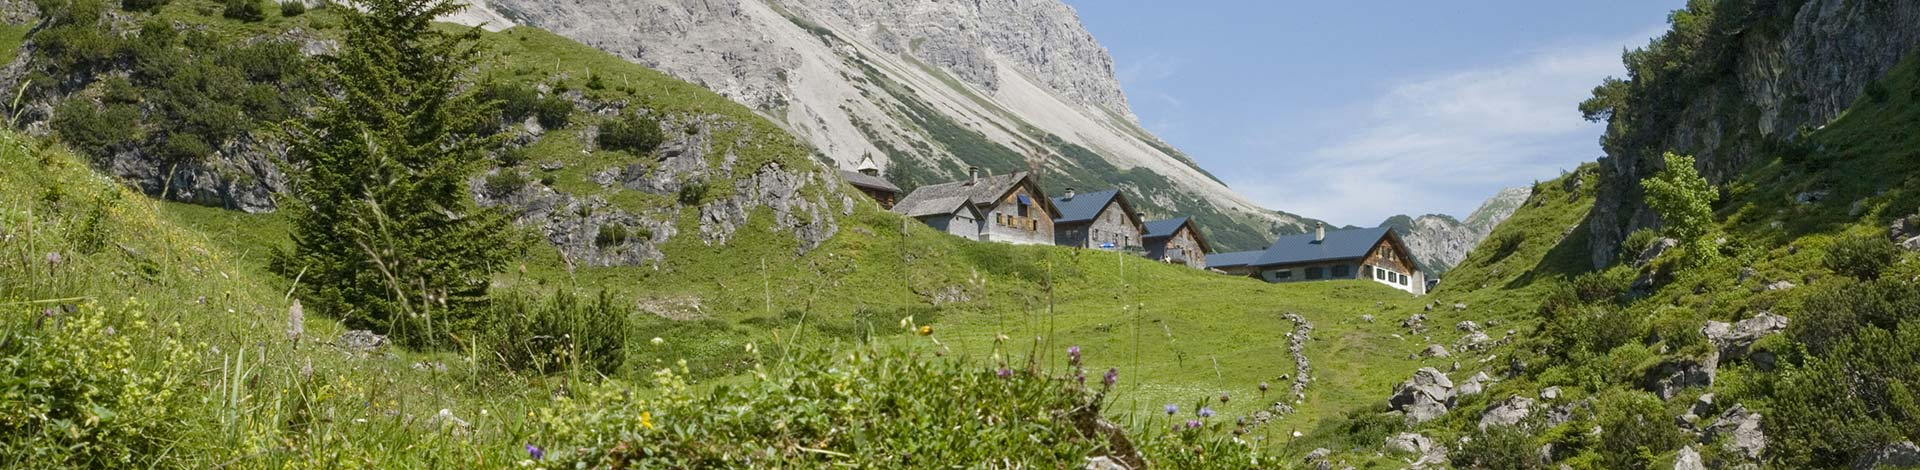 Alpe Klesenza © Biosphärenpark Großes Walsertal